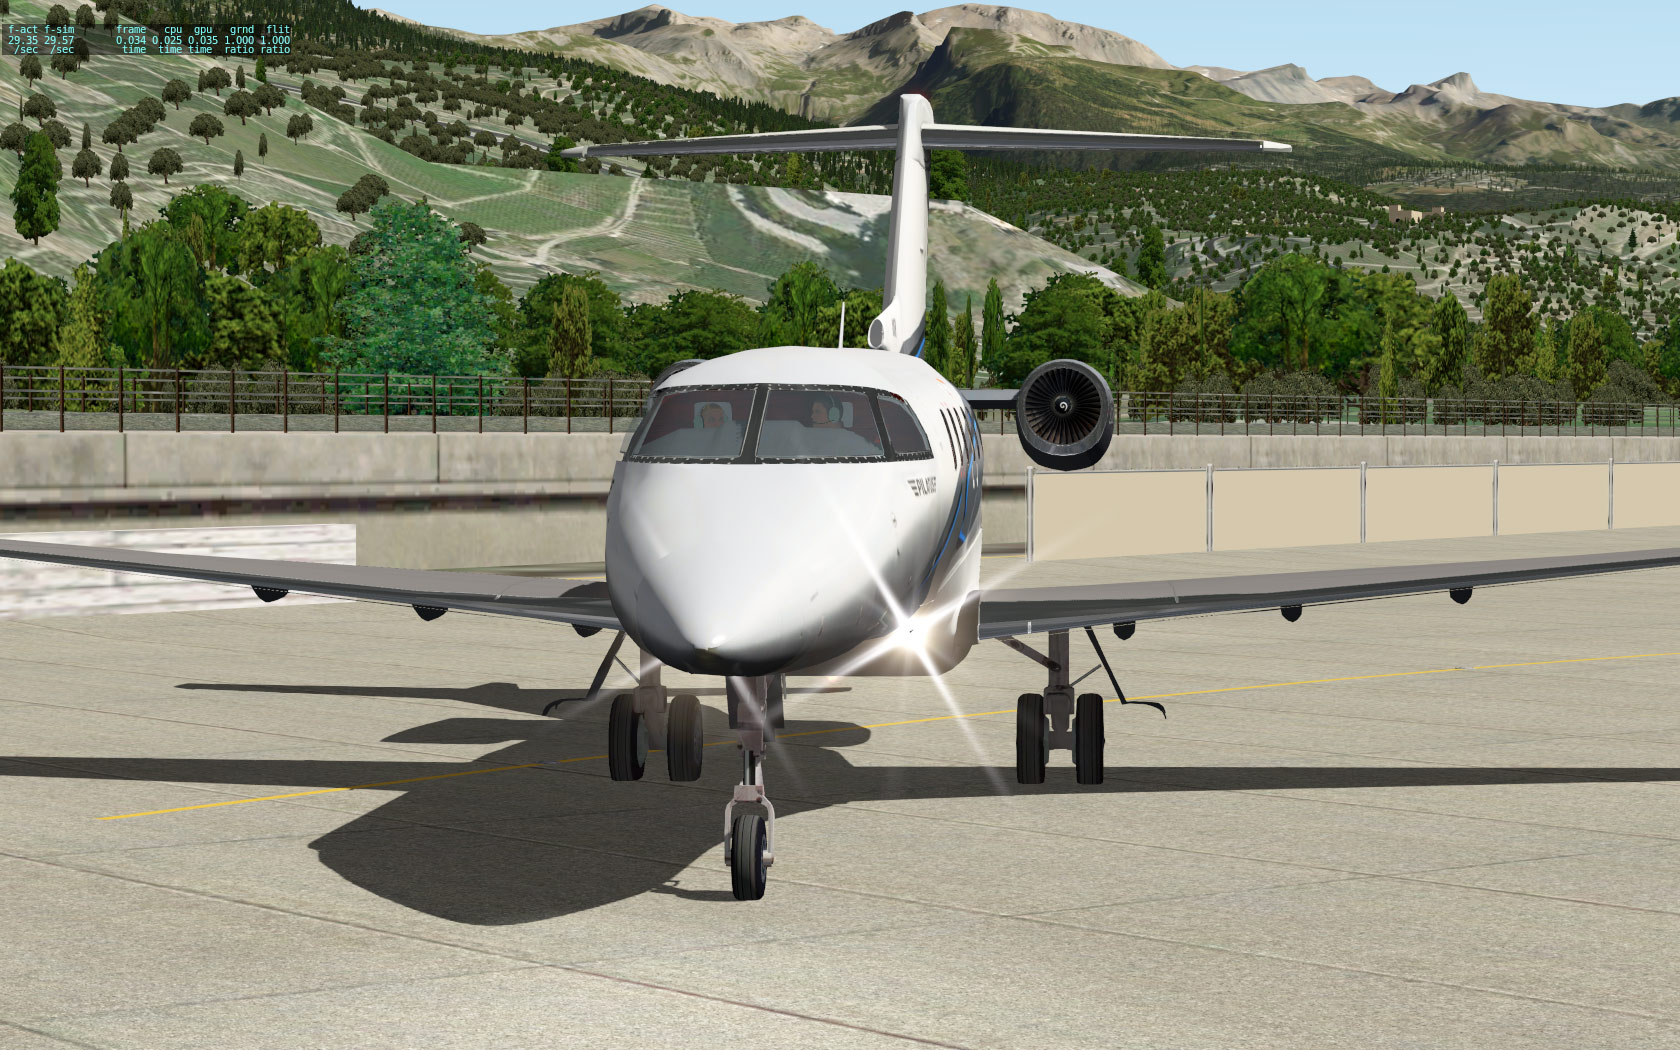 News! - Aircraft Updated to X-plane11 : Pilatus PC-24 & PC12